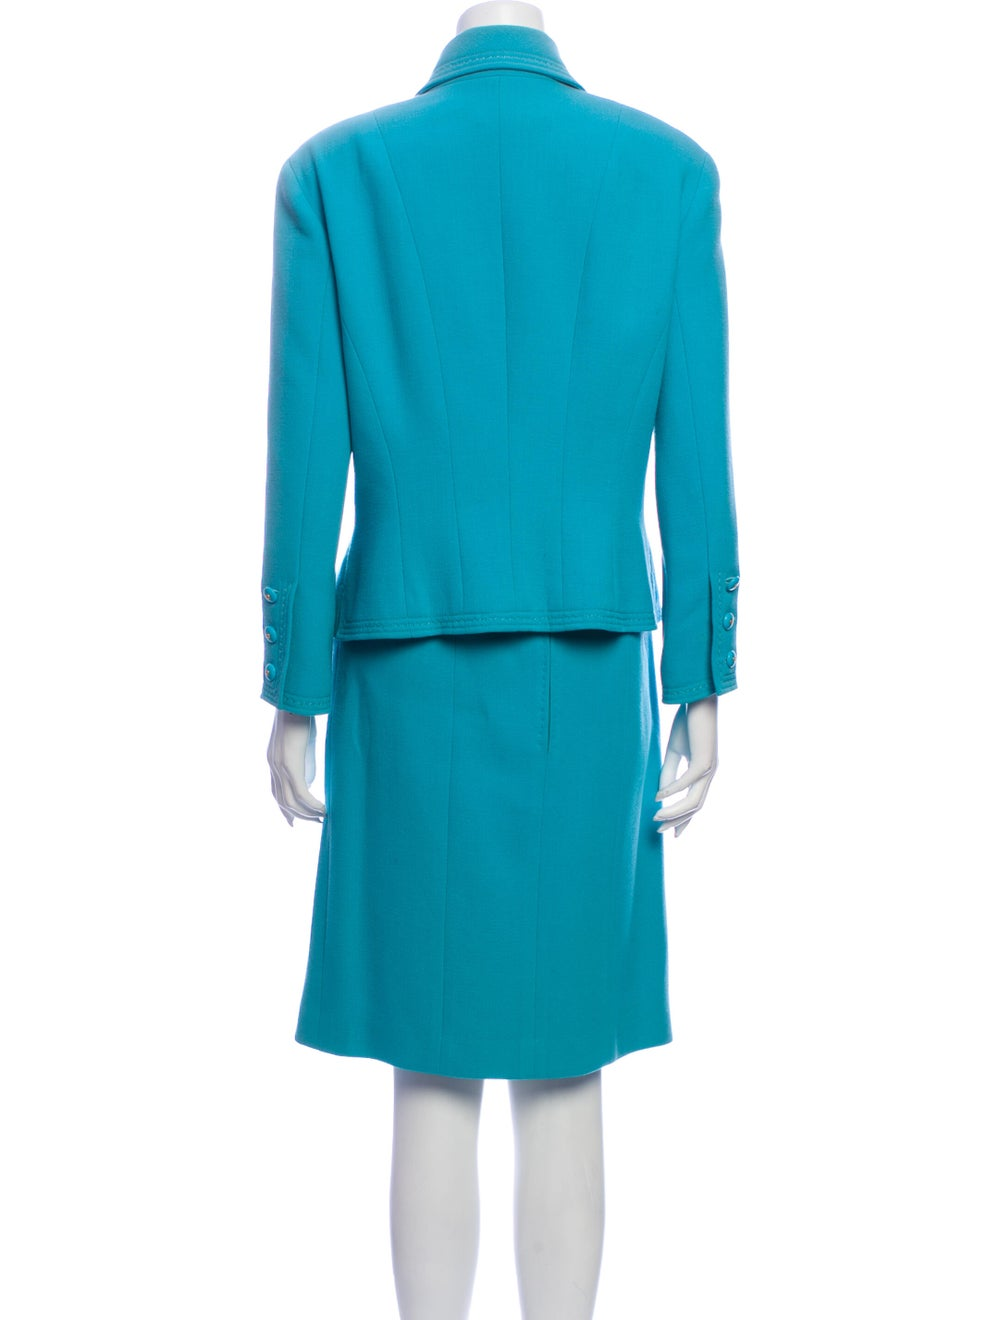 Chanel Vintage 1980's Skirt Suit Blue - image 3